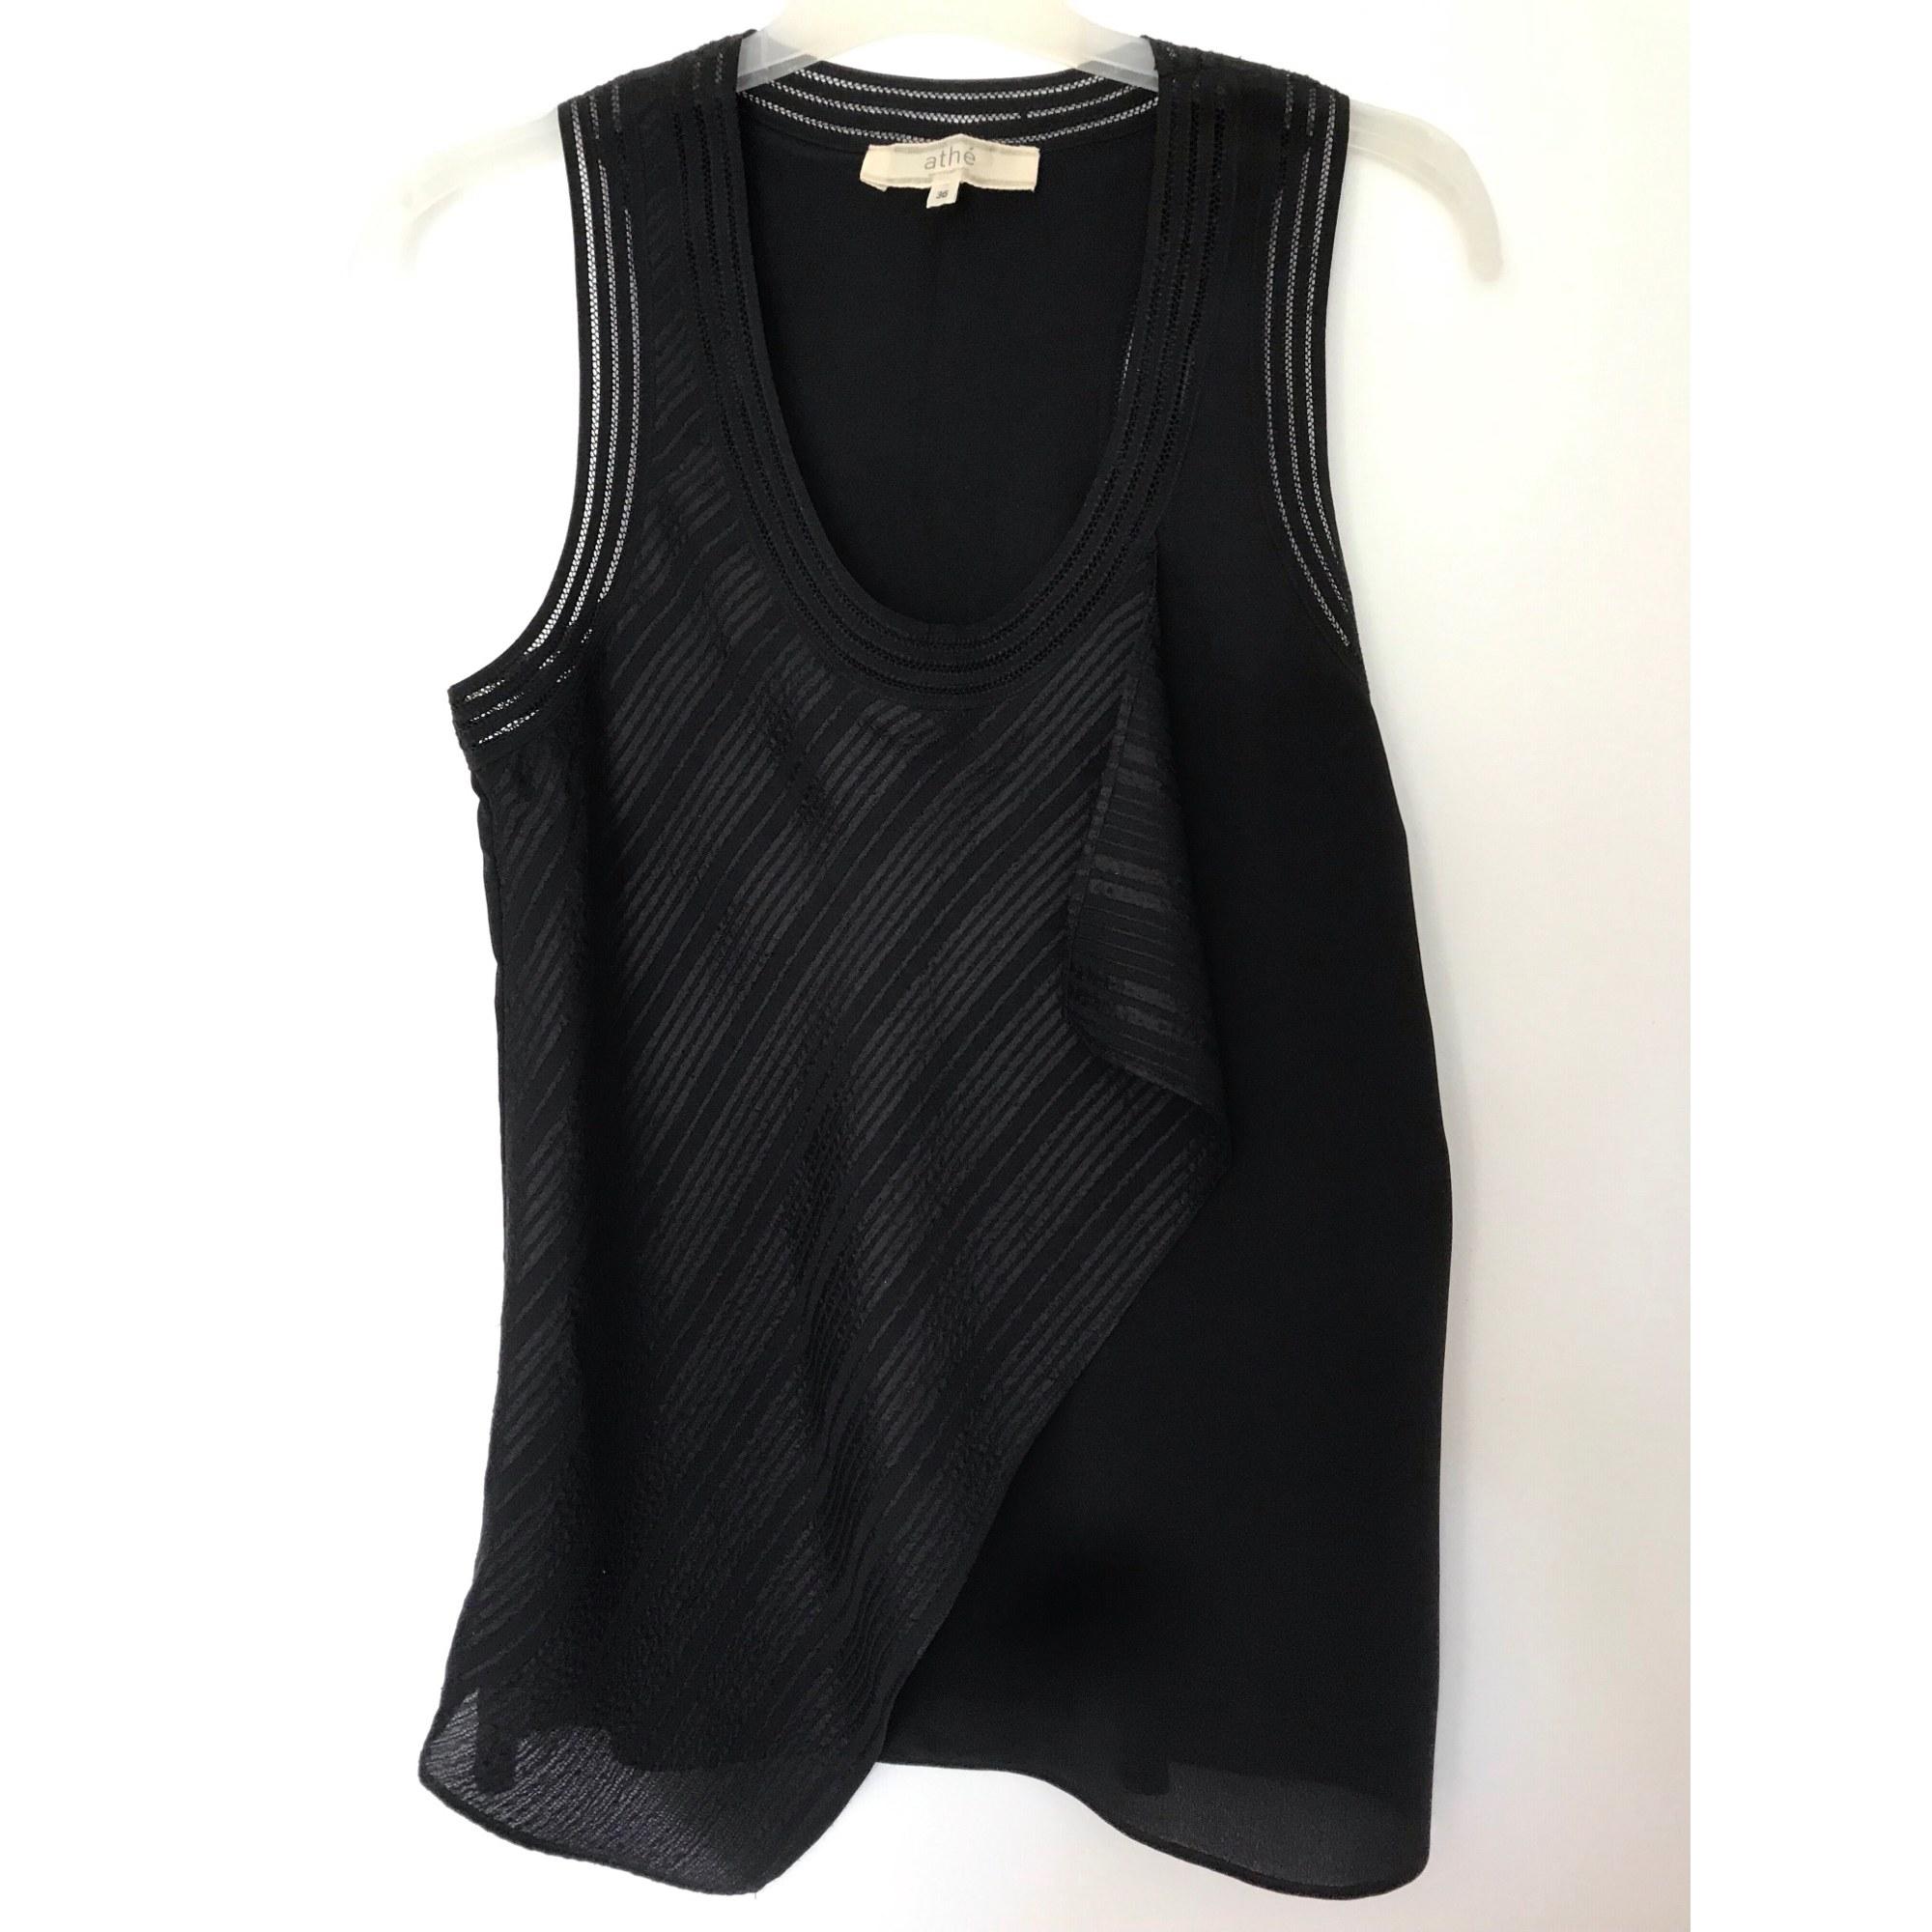 Top, tee-shirt ATHÉ VANESSA BRUNO Noir